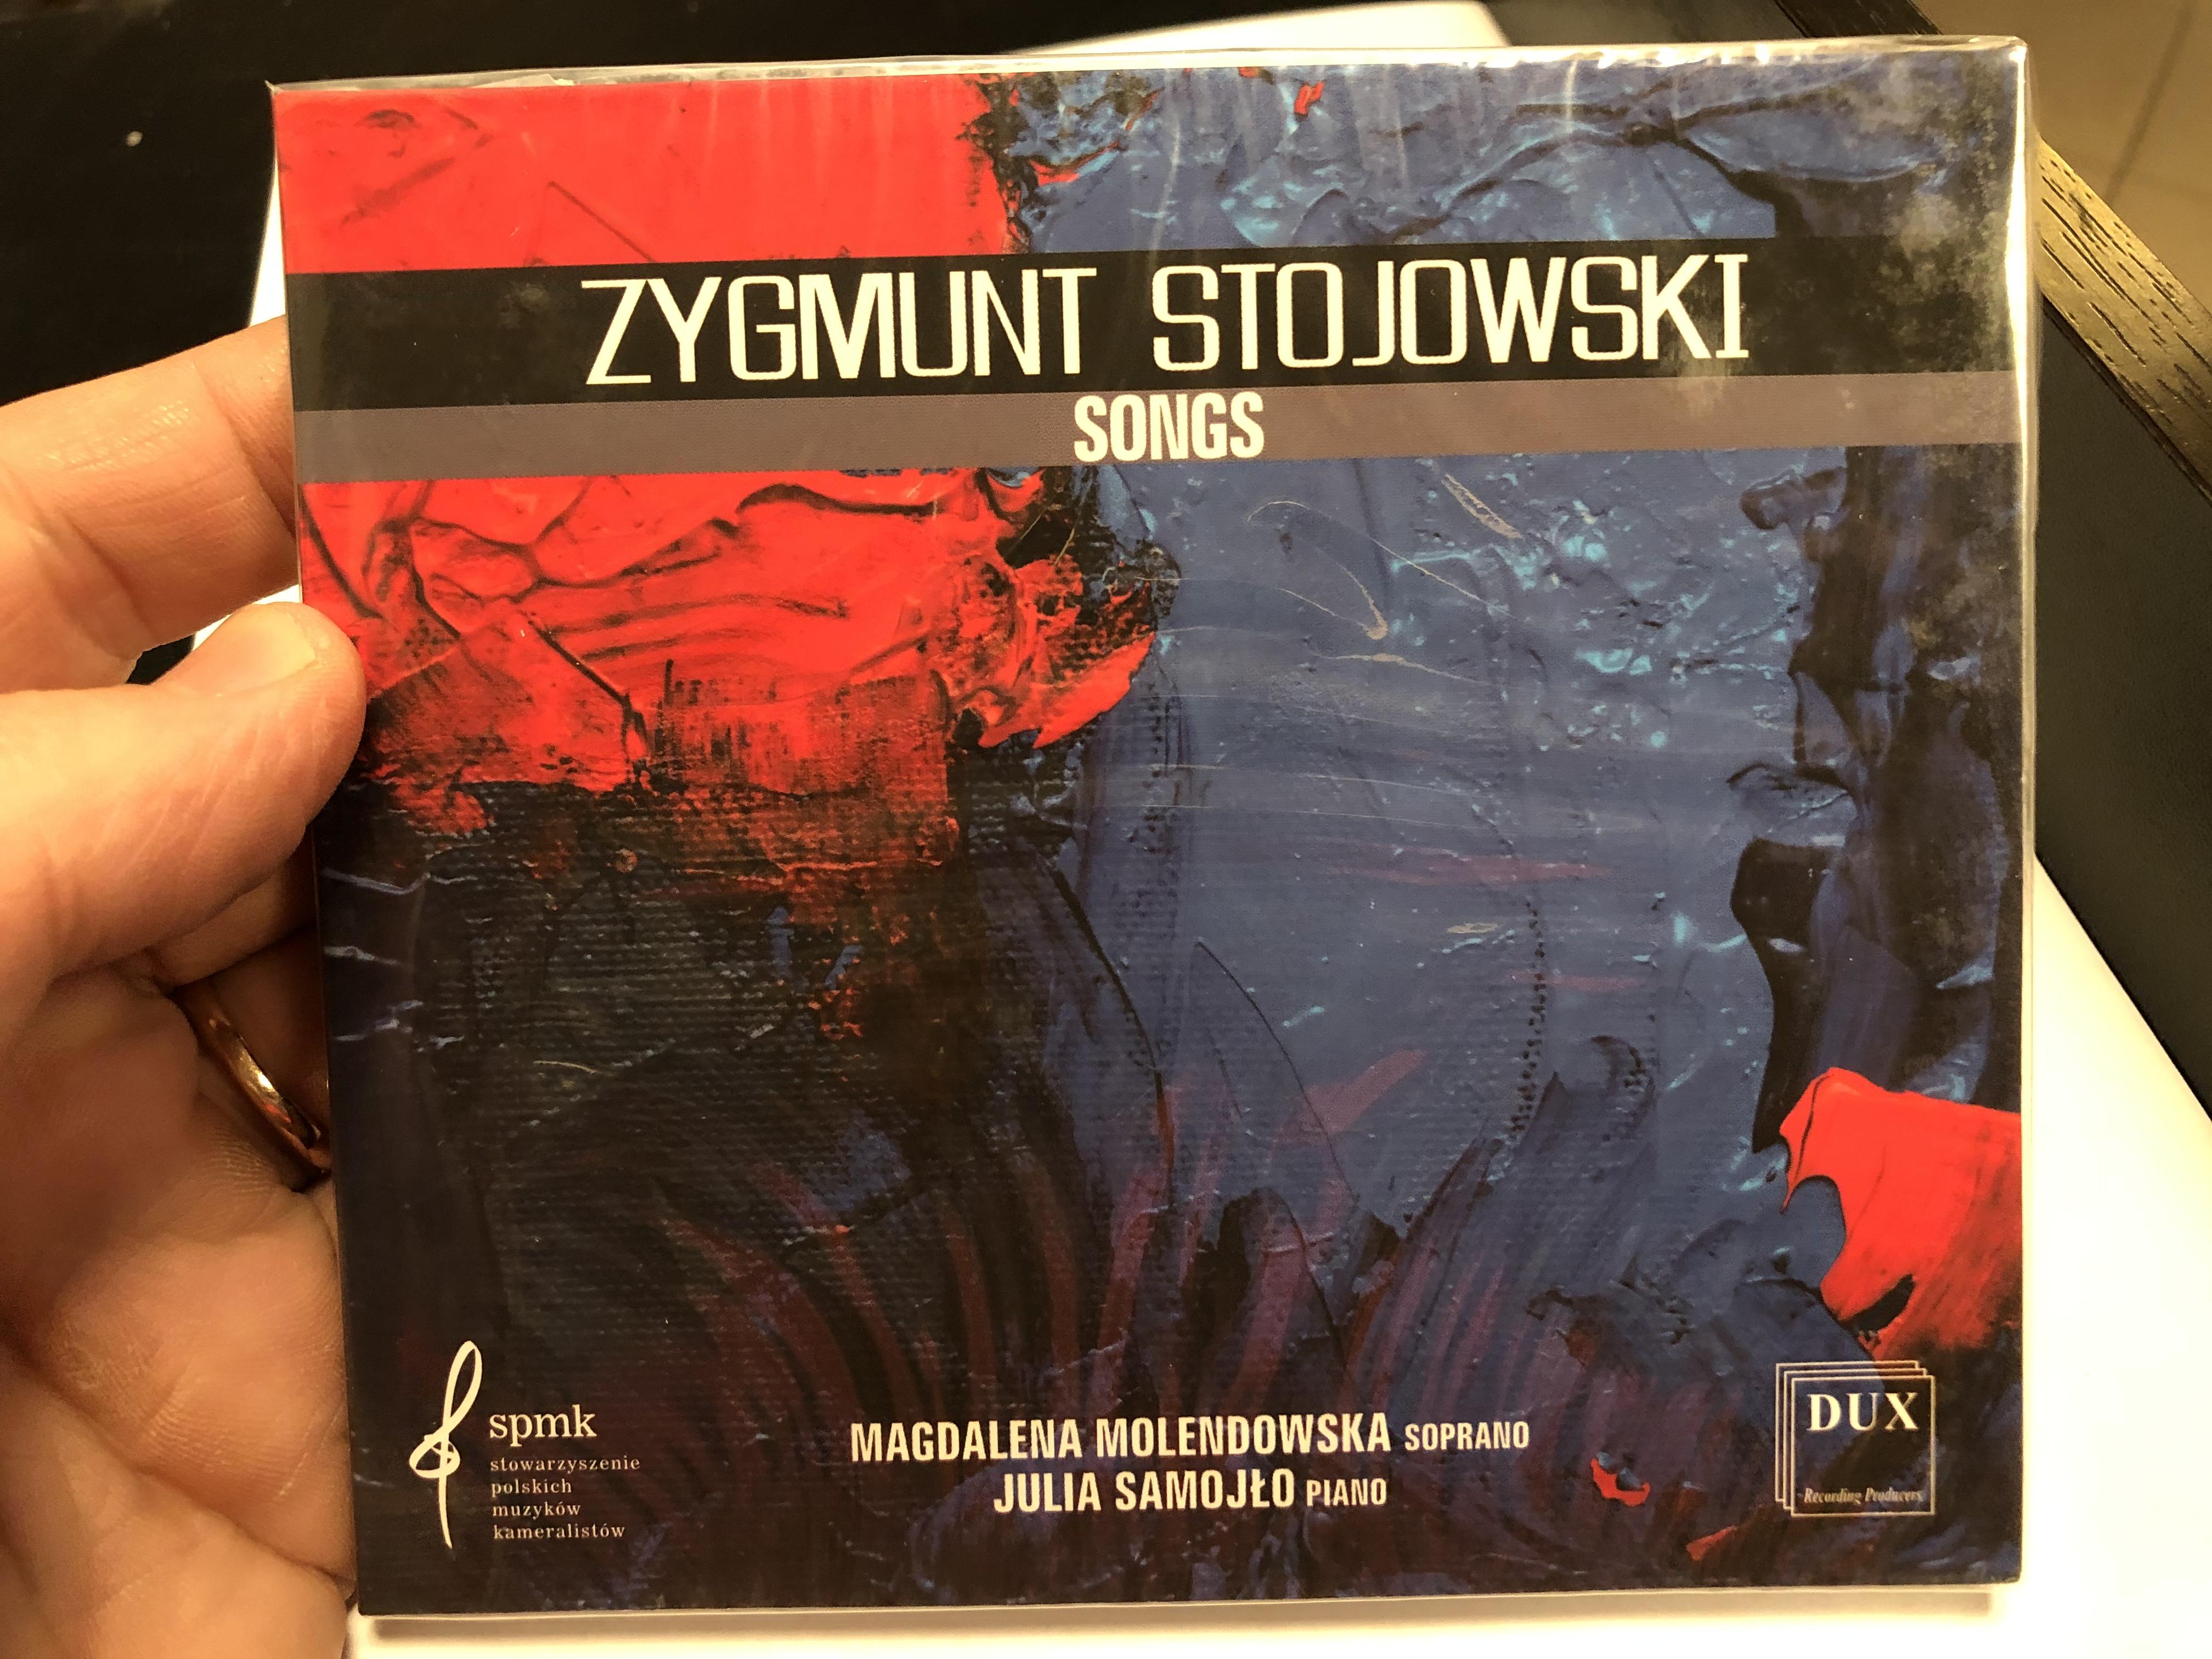 zygmunt-stojowski-songs-magdalena-molendowska-soprano-julia-samojlo-piano-dux-recording-audio-cd-2019-dux-7580-1-.jpg